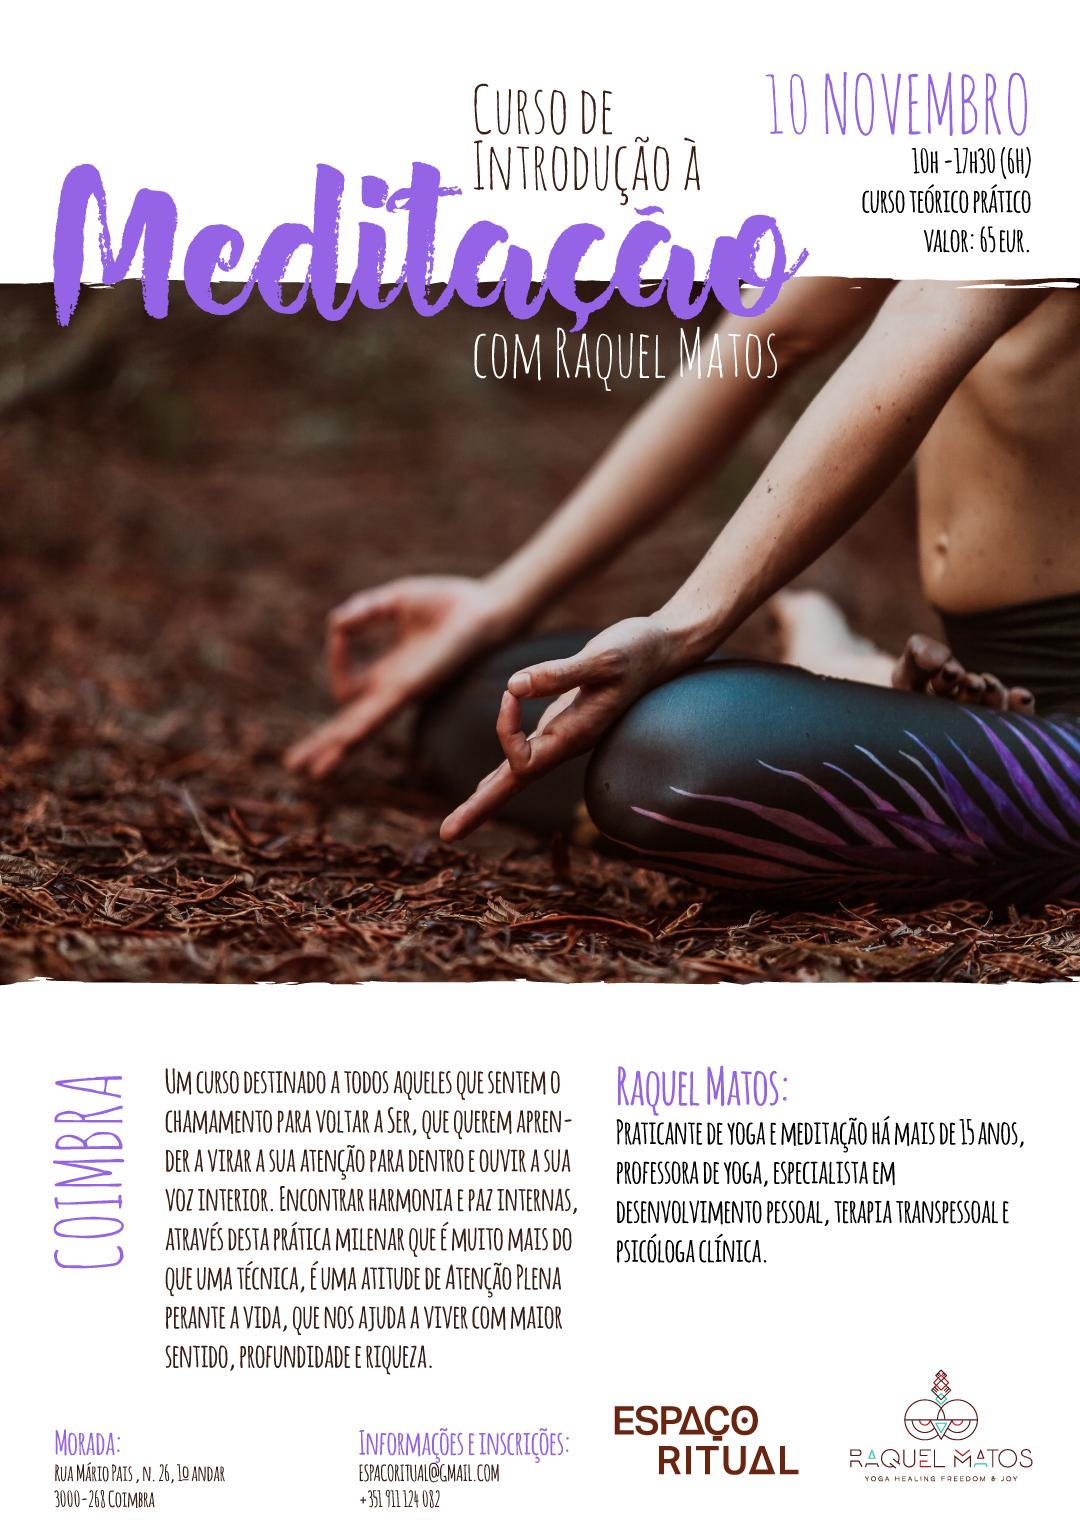 RM_Curso-de-introd-meditacao_10nov.png